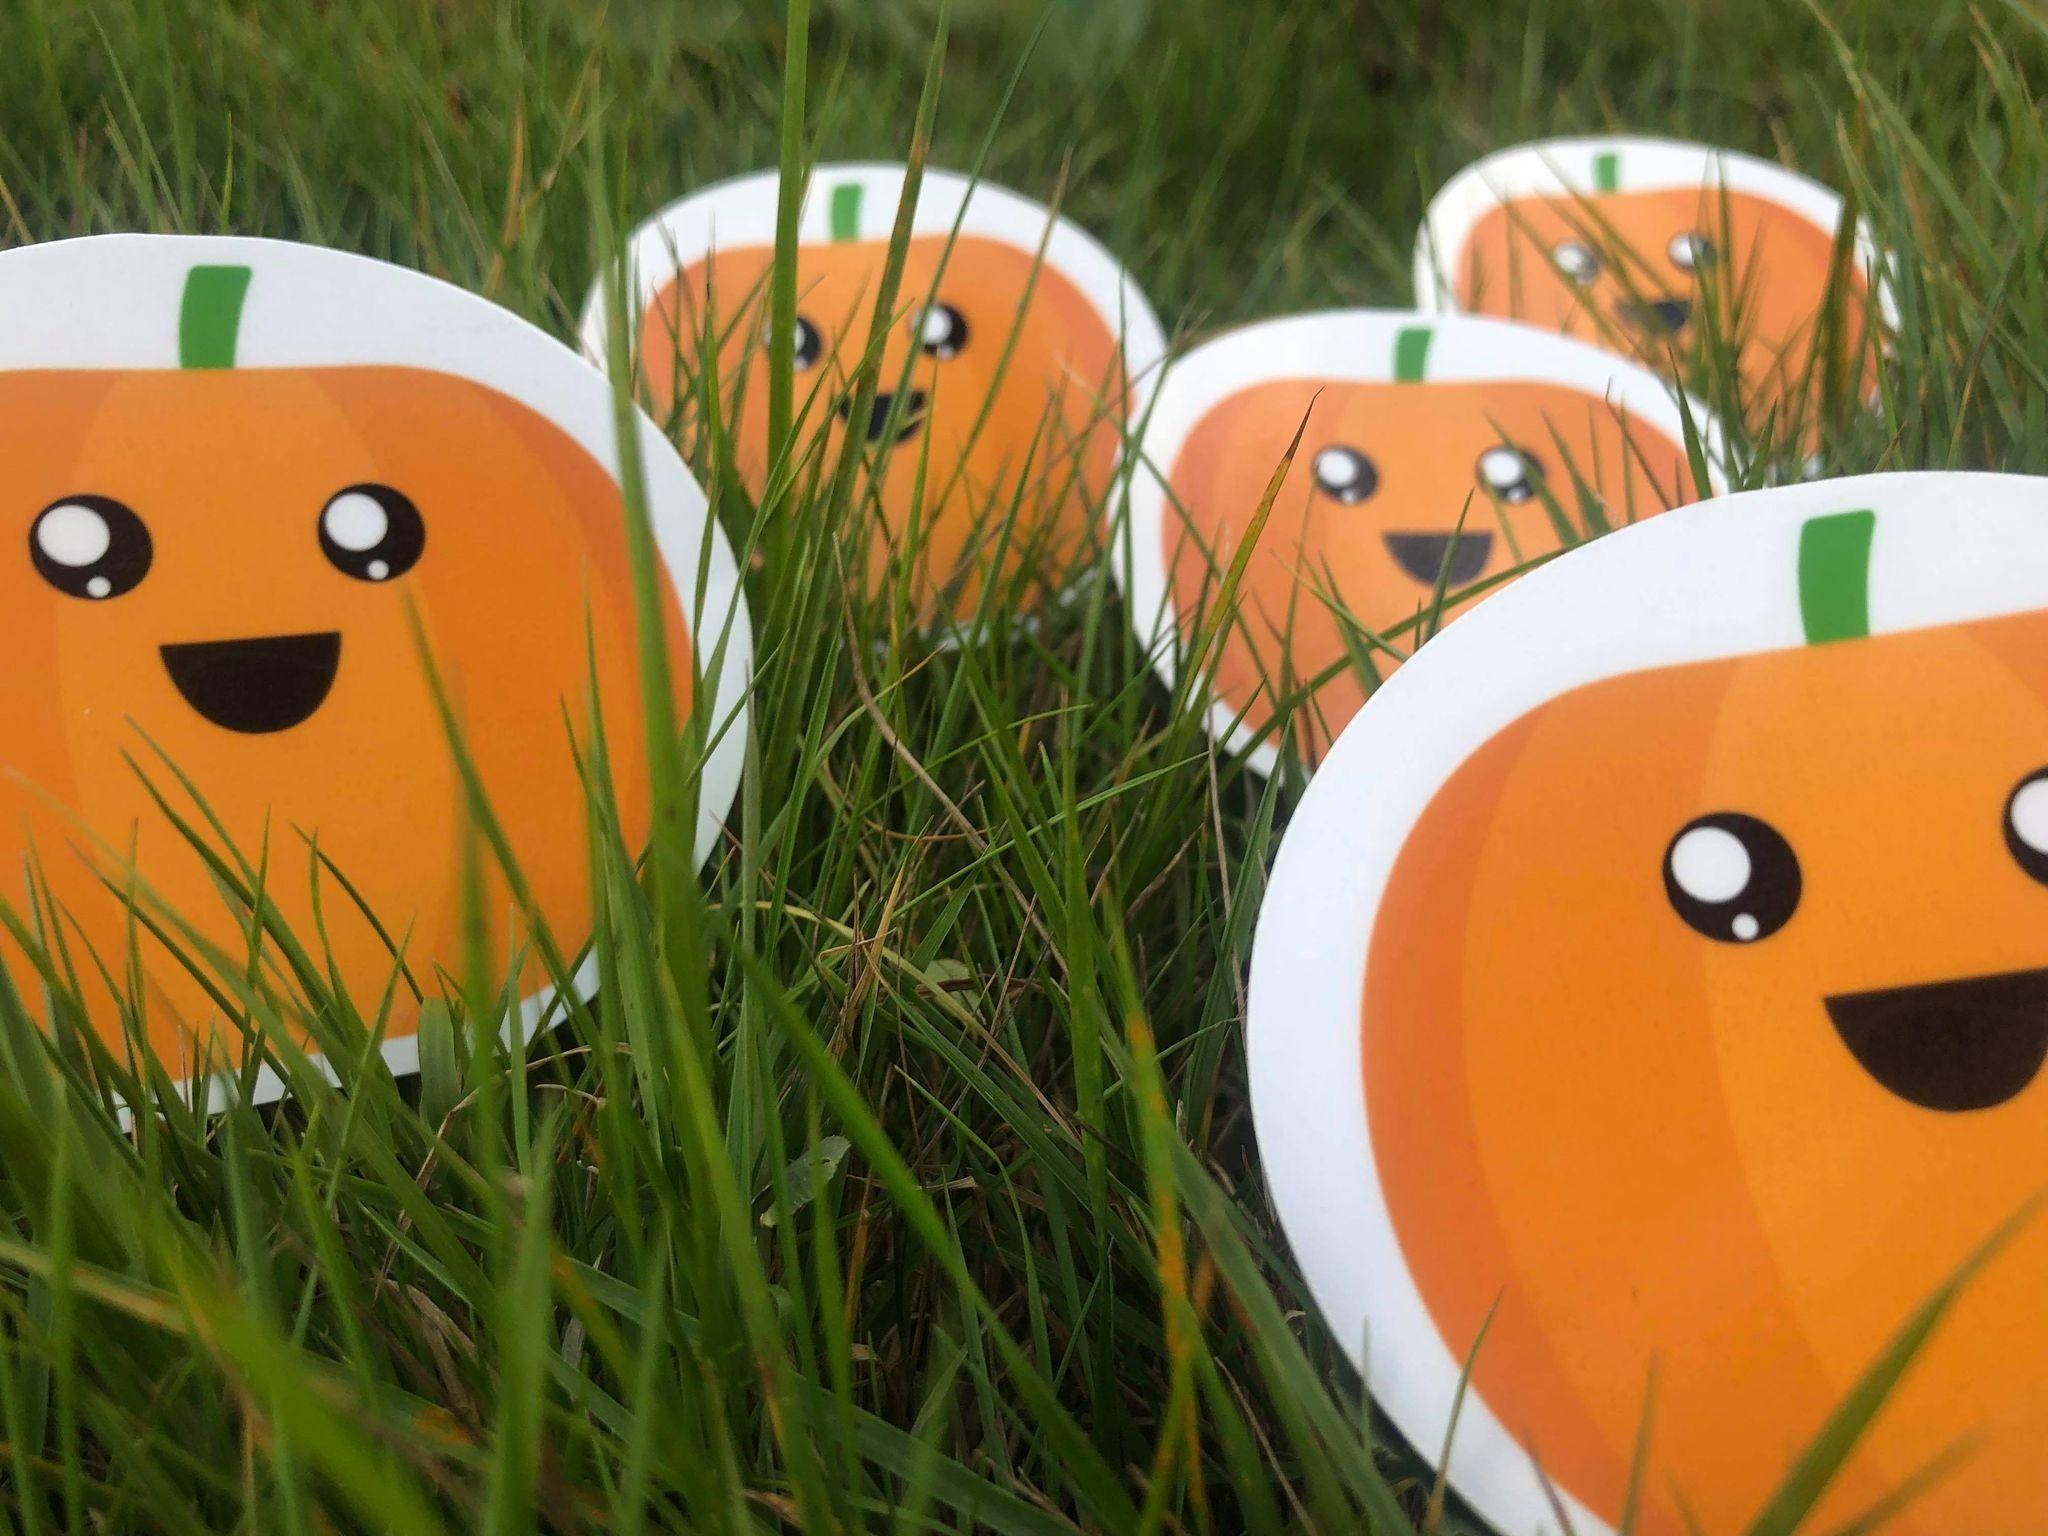 Happy Halloween Pumpkin Sticker , Halloween Vinyl Sticker, Medieval Sticker, Horror Sticker, Halloween stickers, water resistant stickers #DndFantasyDecal #WaterBottleSticker #PumpkinPatchDecal #OrangeVinylSticker #MediumSizeSticker #GothicSpookyPet #NotepadAccessory #AutumnSalemSpooky #HappyFruitSticker #GothEmoPunkDecal